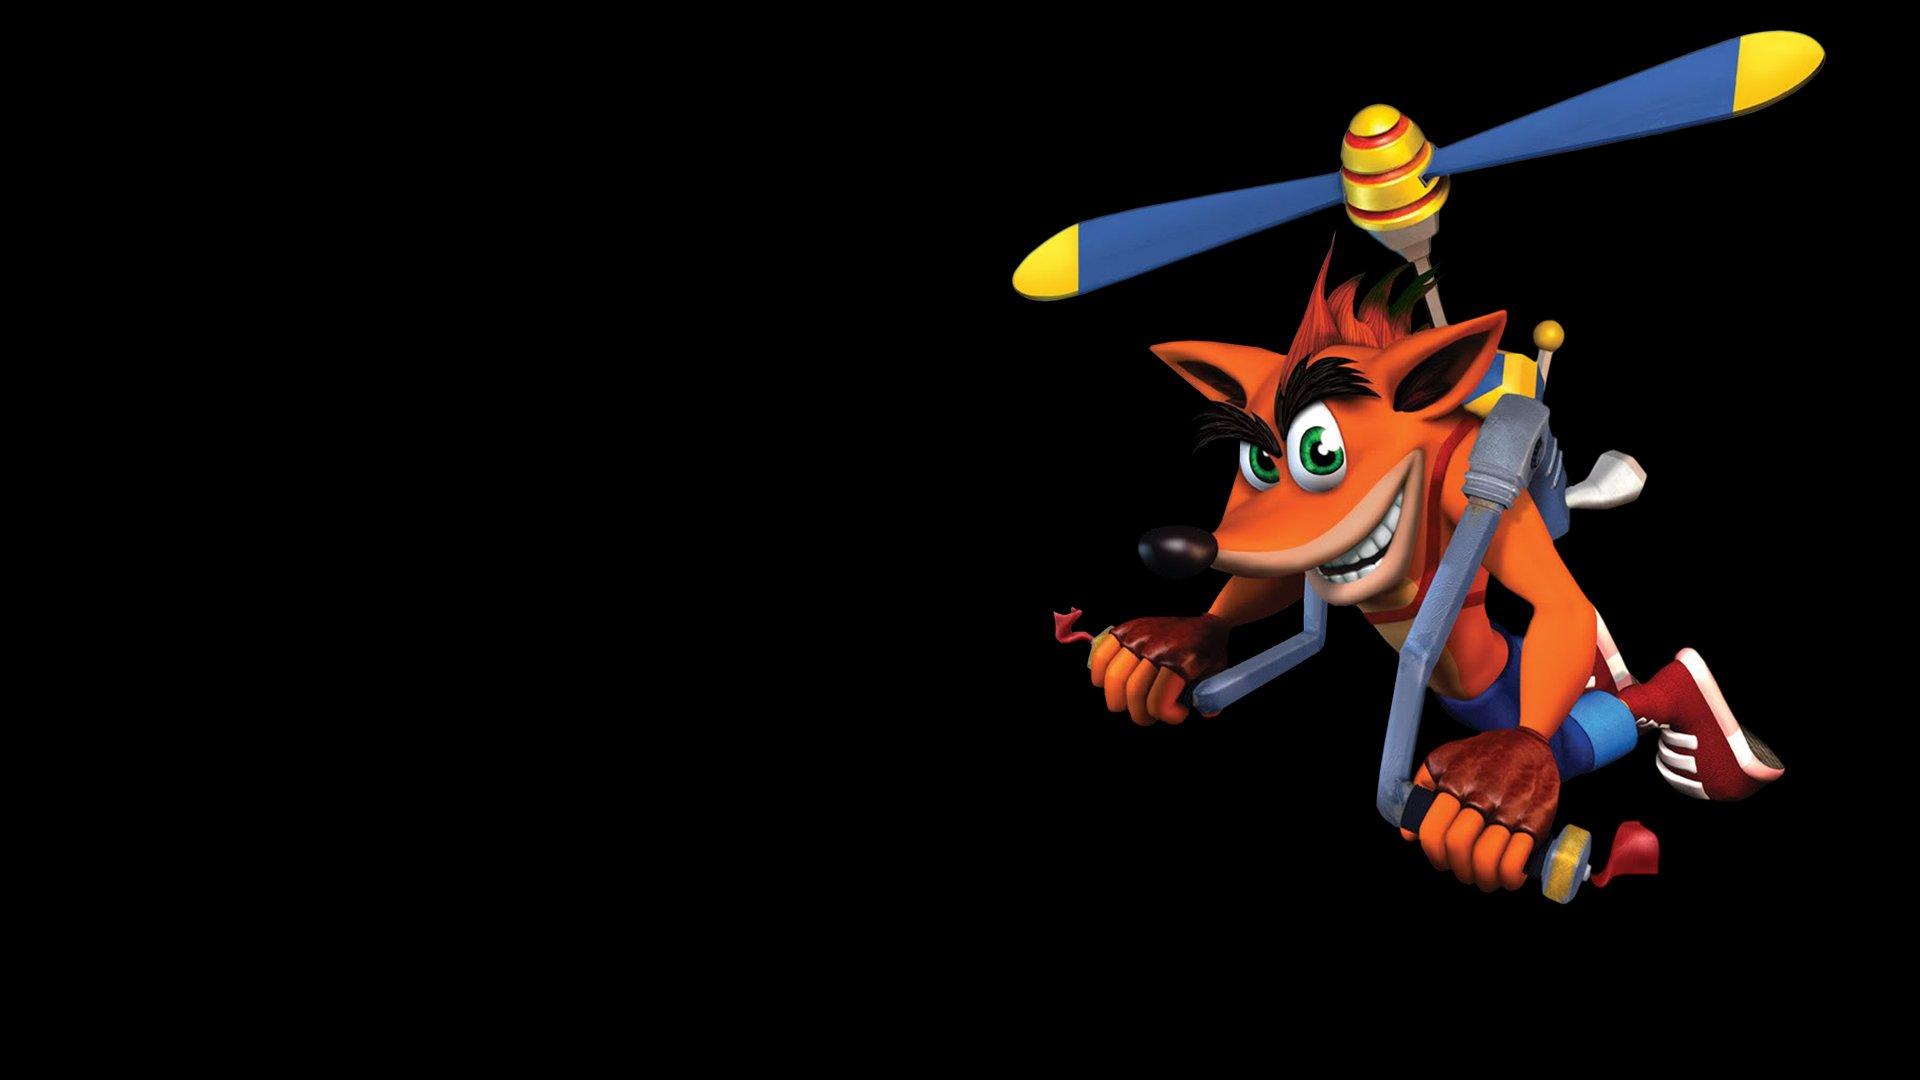 Crash Bandicoot HD Wallpaper | Background Image ...